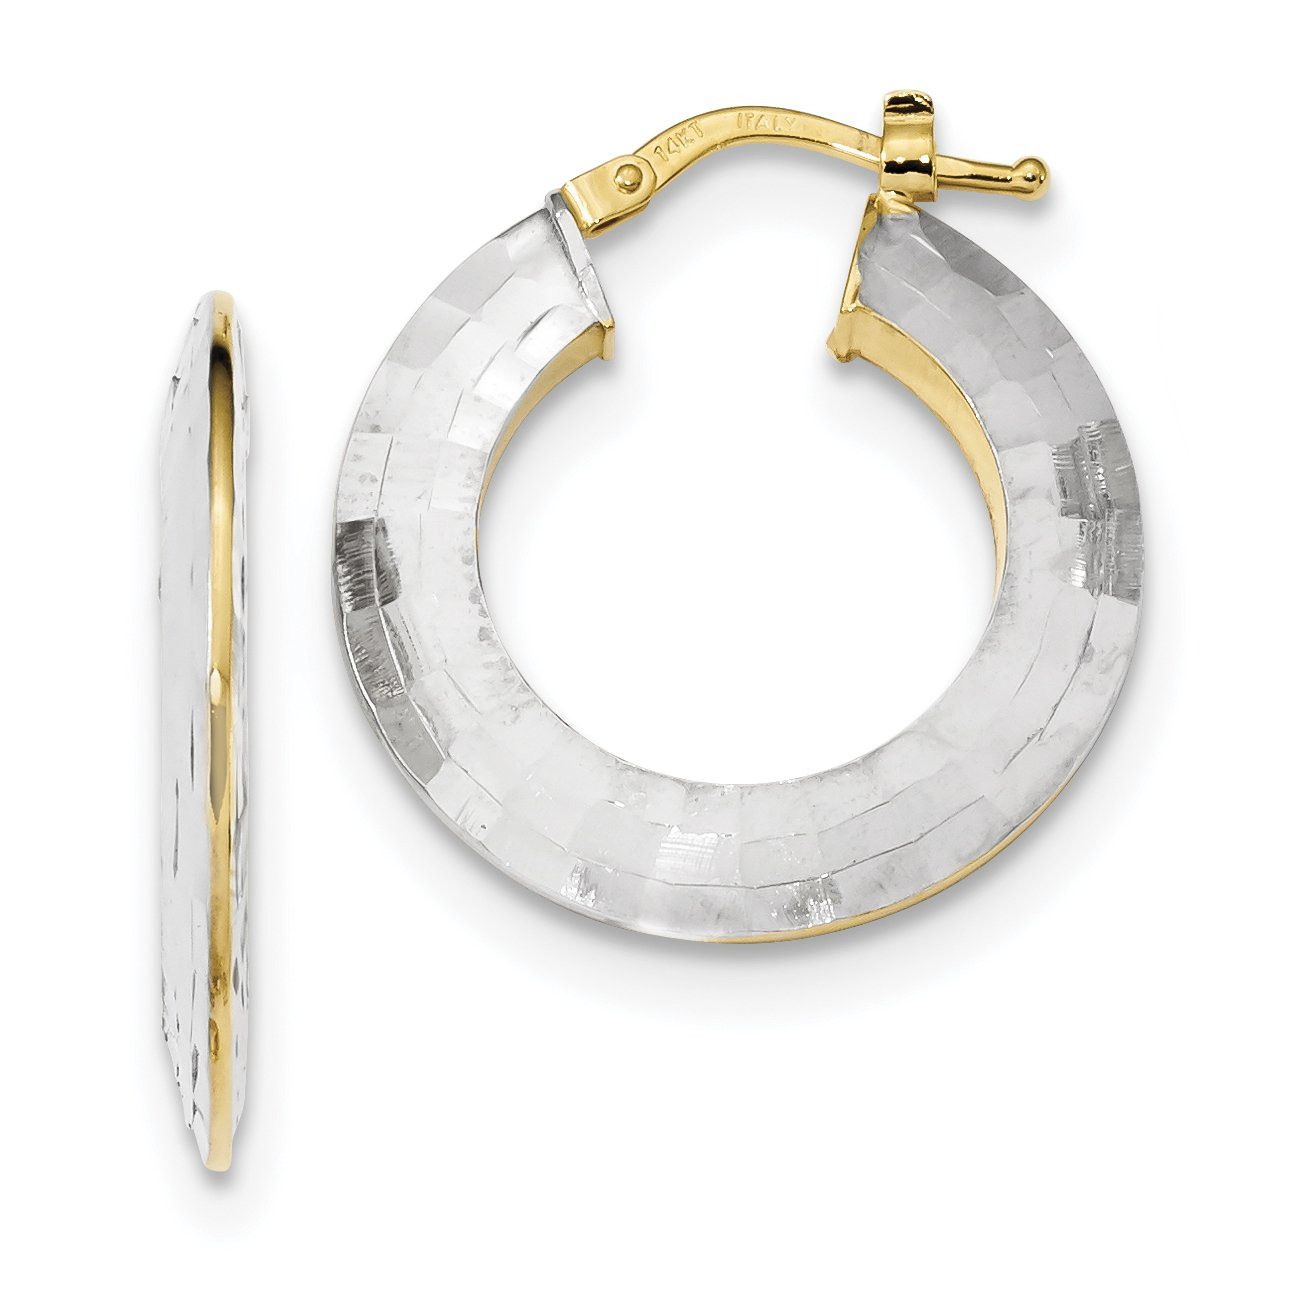 ICE CARATS 14k Gold White Textured Hoop Earrings Ear Hoops Set Fine Jewelry Gift Set For Women Heart